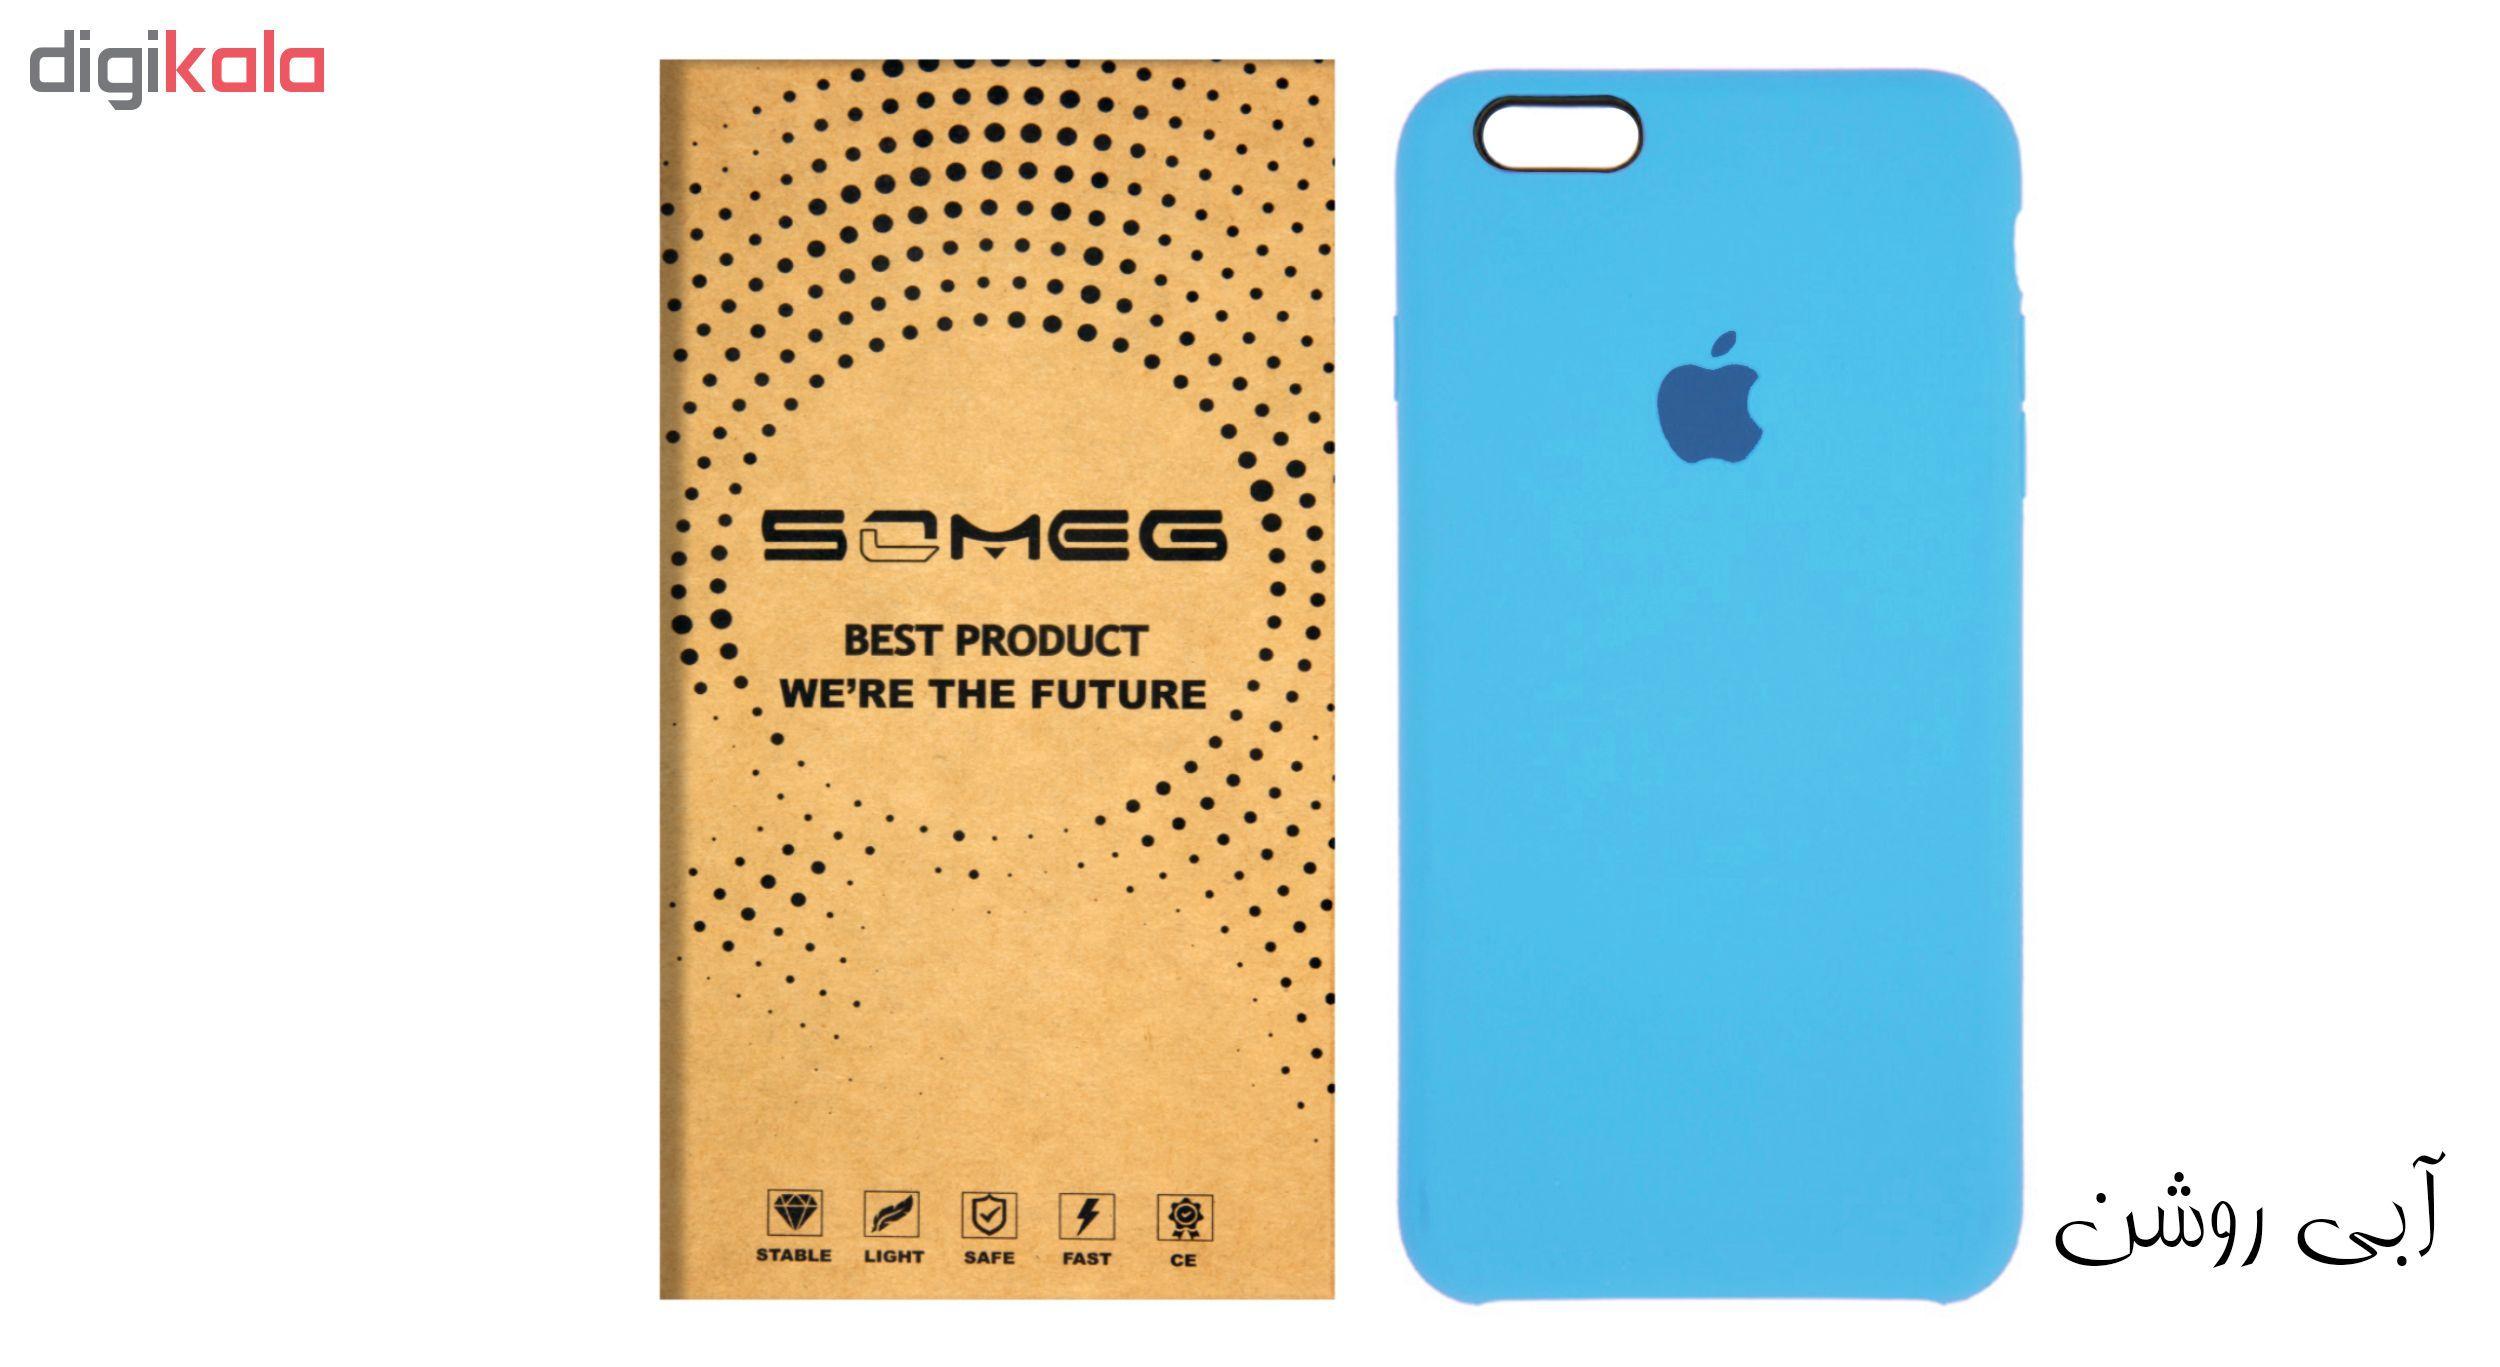 کاور سومگ مدل SIC مناسب برای گوشی موبایل اپل iPhone 6/6s main 1 12